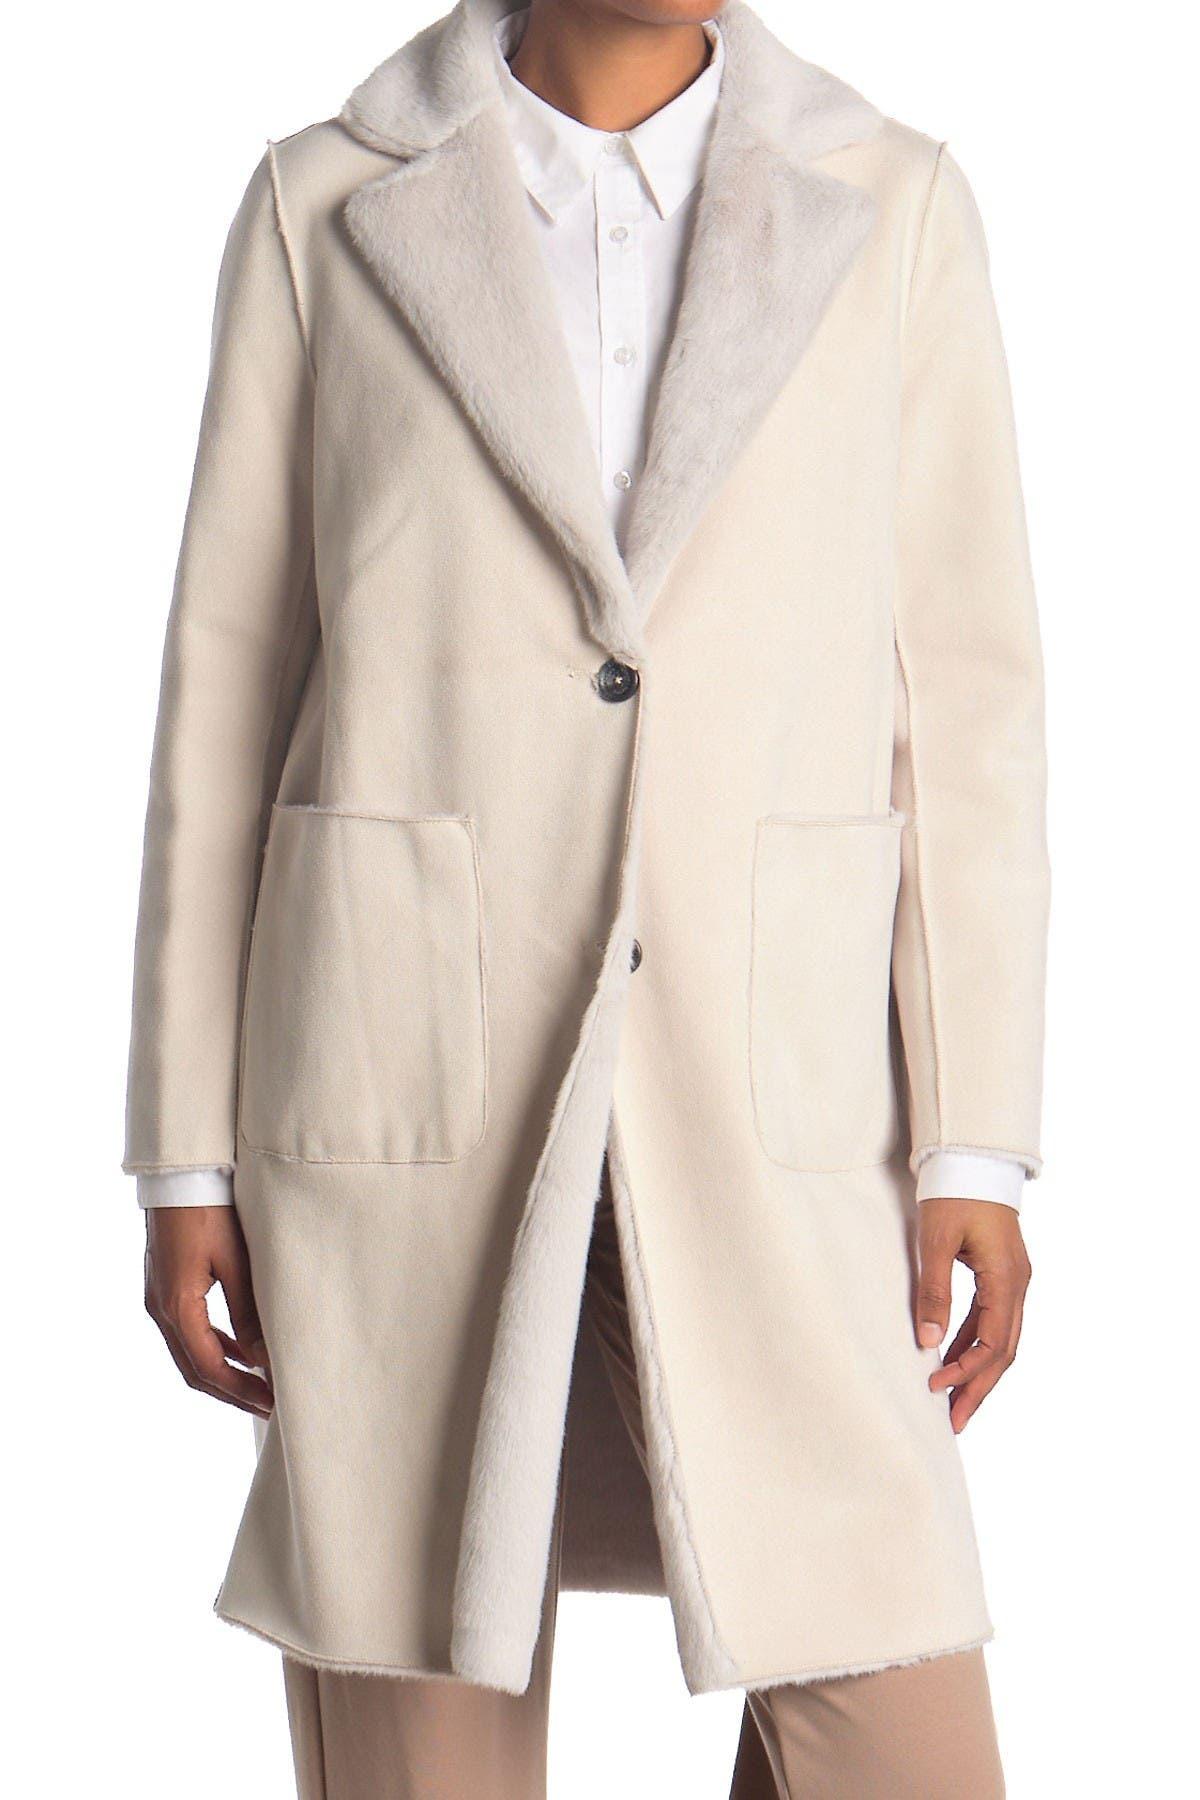 Image of Lauren Ralph Lauren Reversible Faux Shearling Long Coat